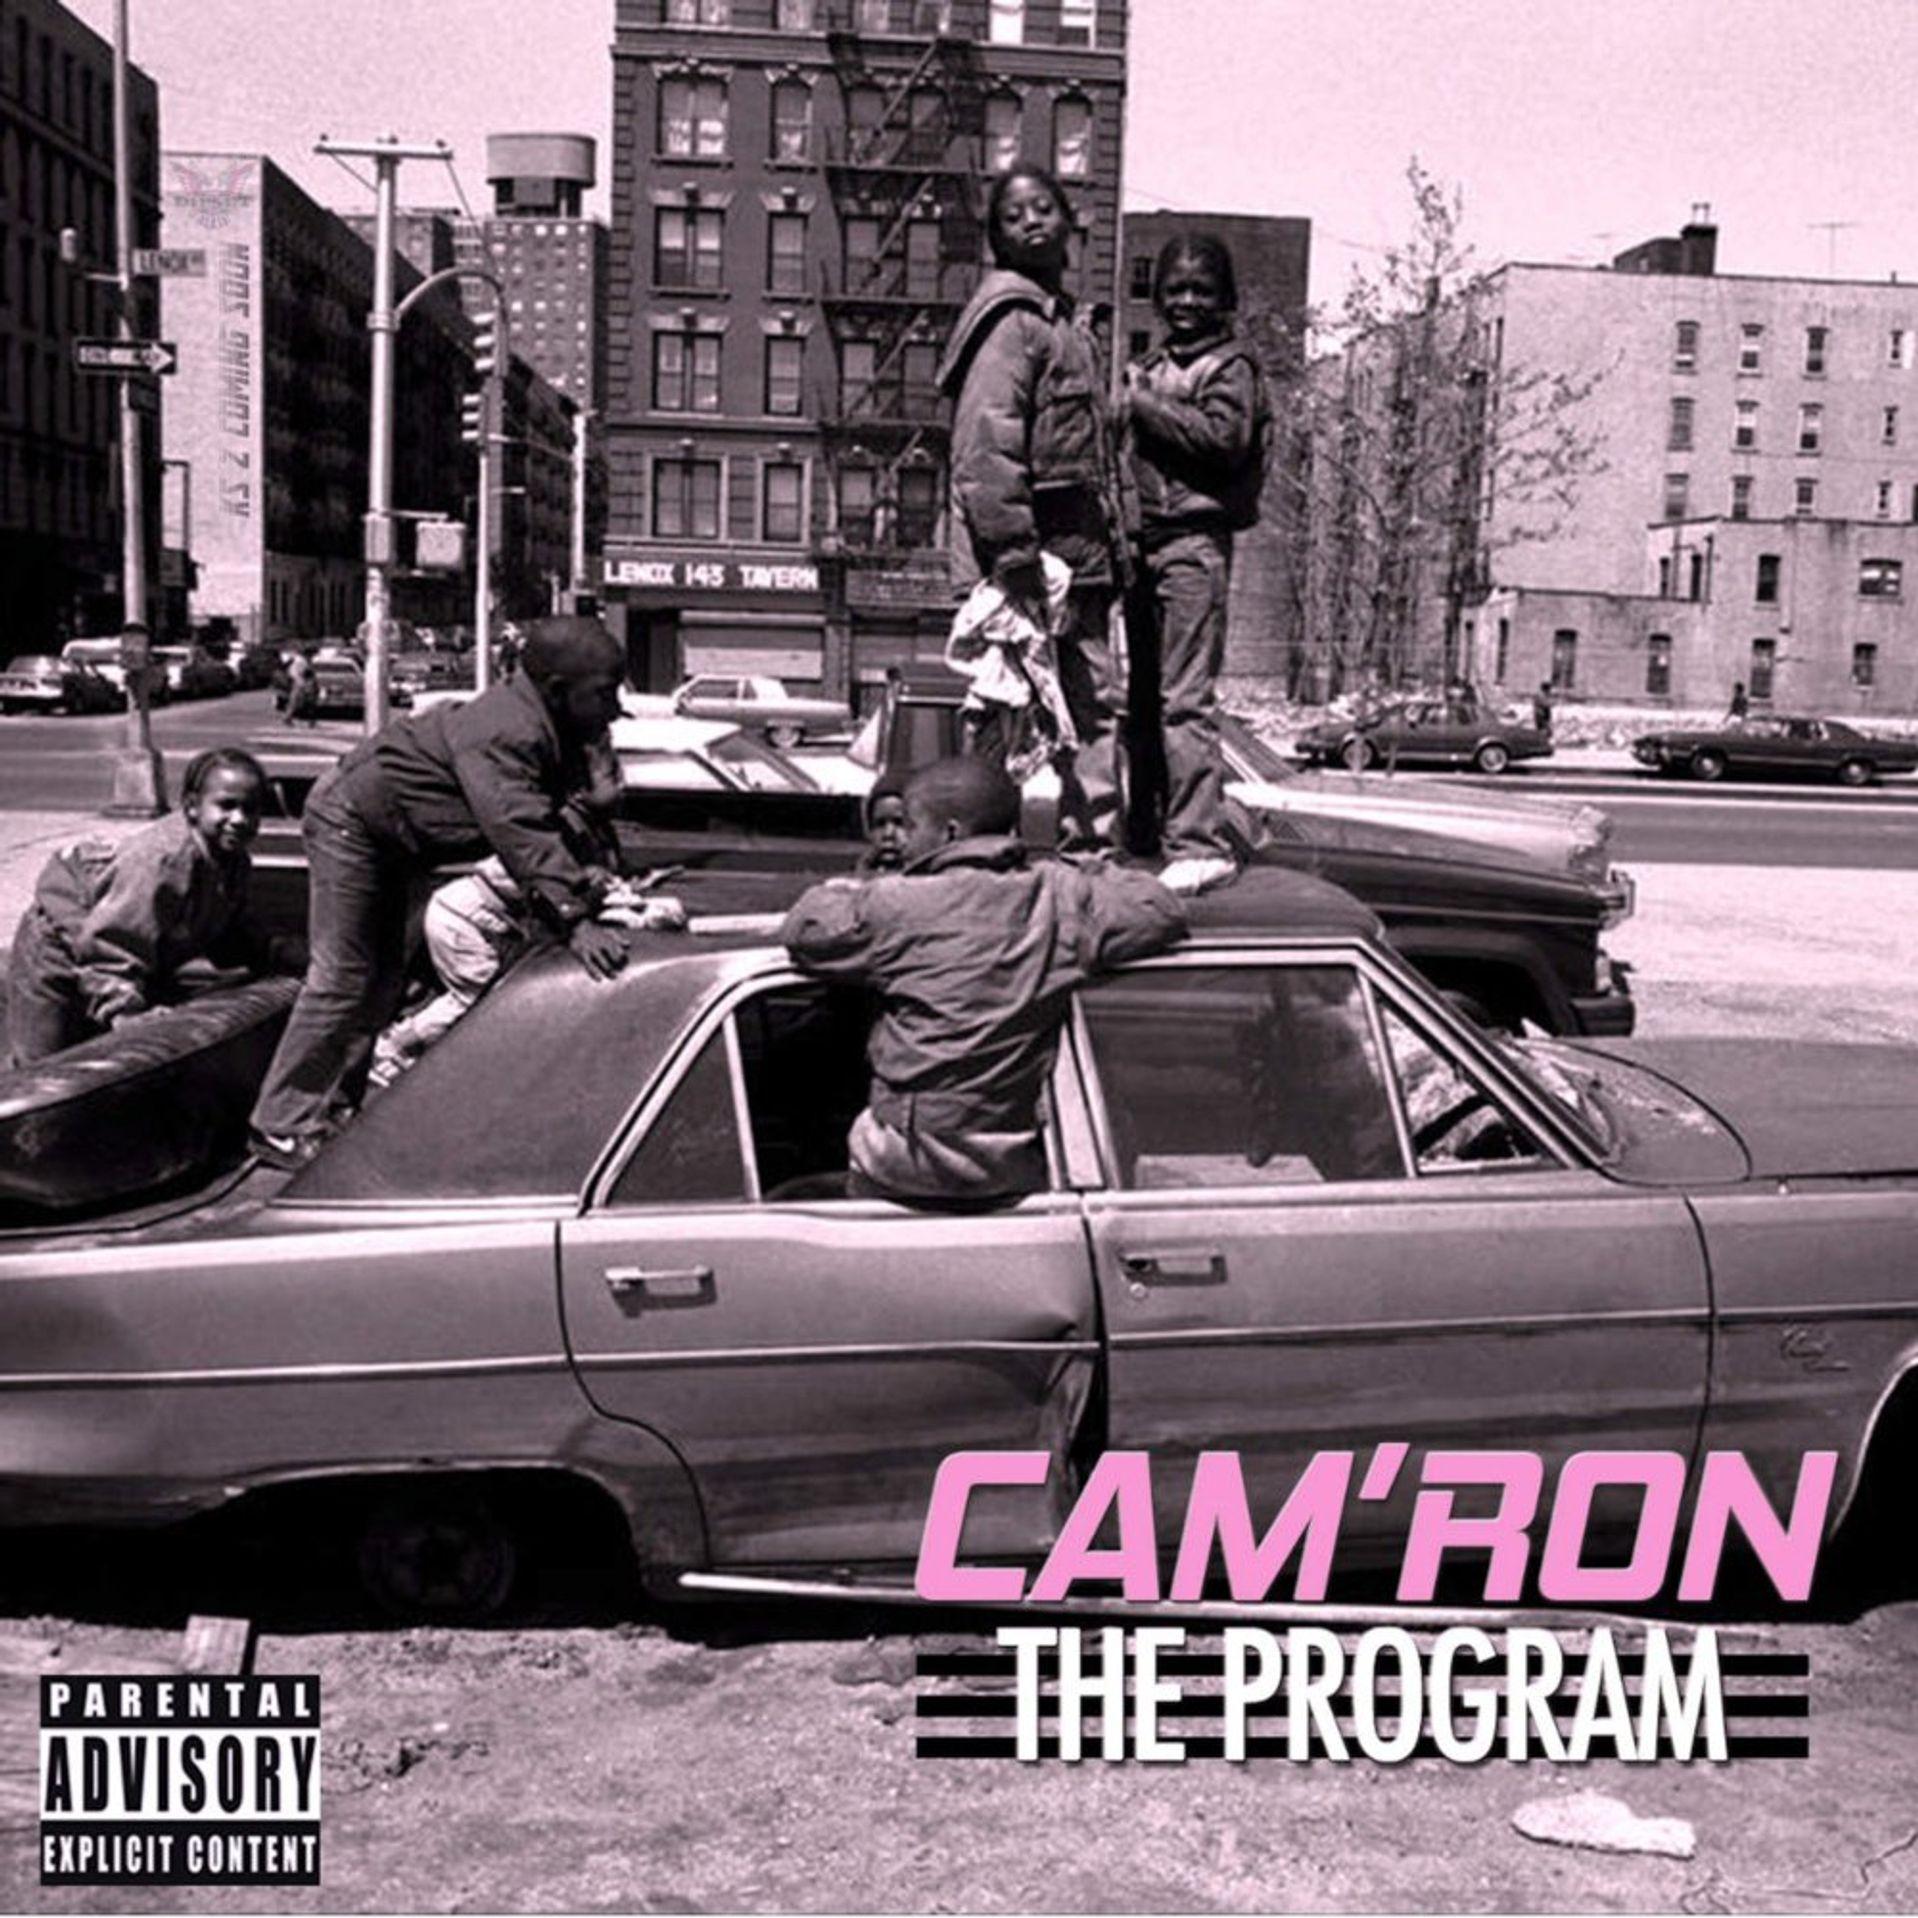 Album Title: The Program by: Cam